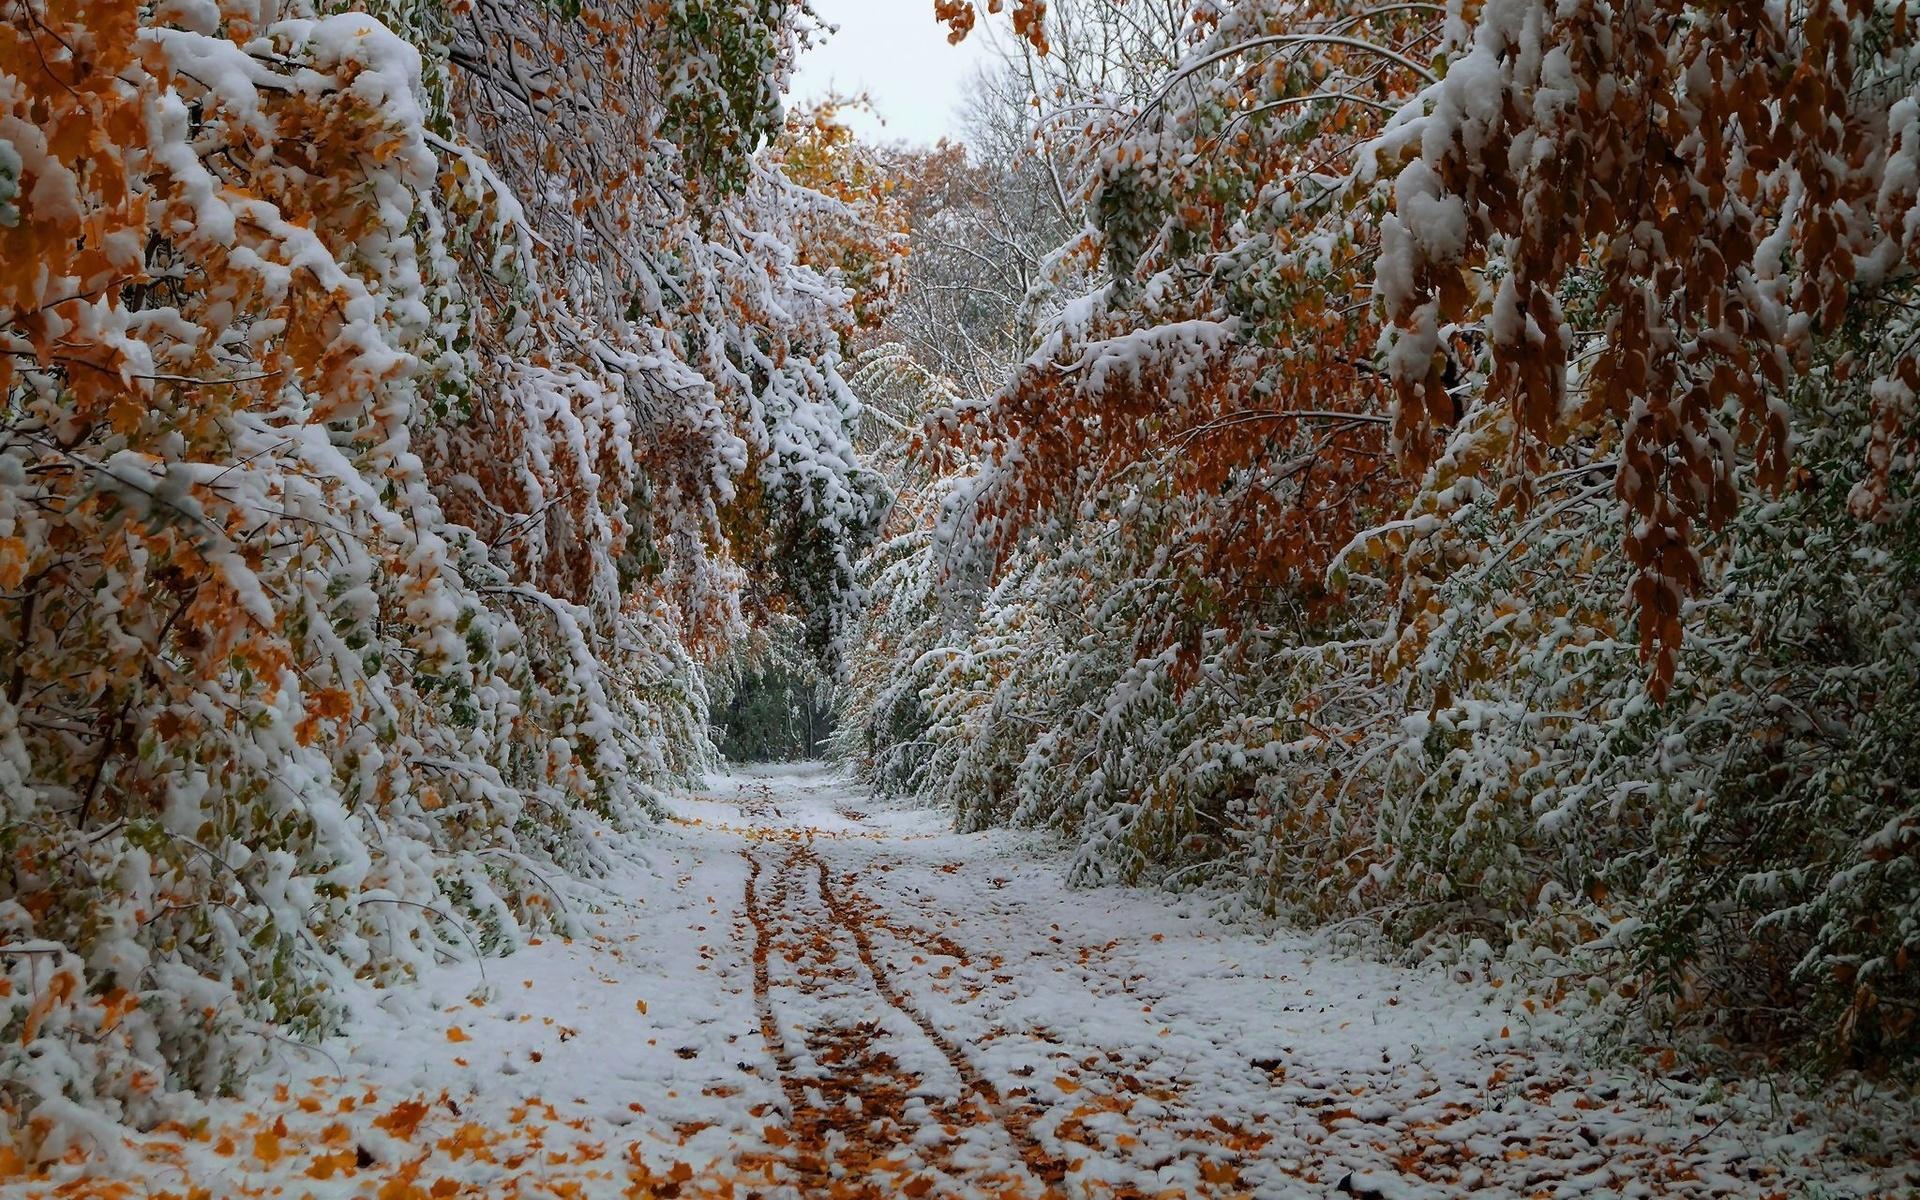 рано осень картинки со снегом журналисты